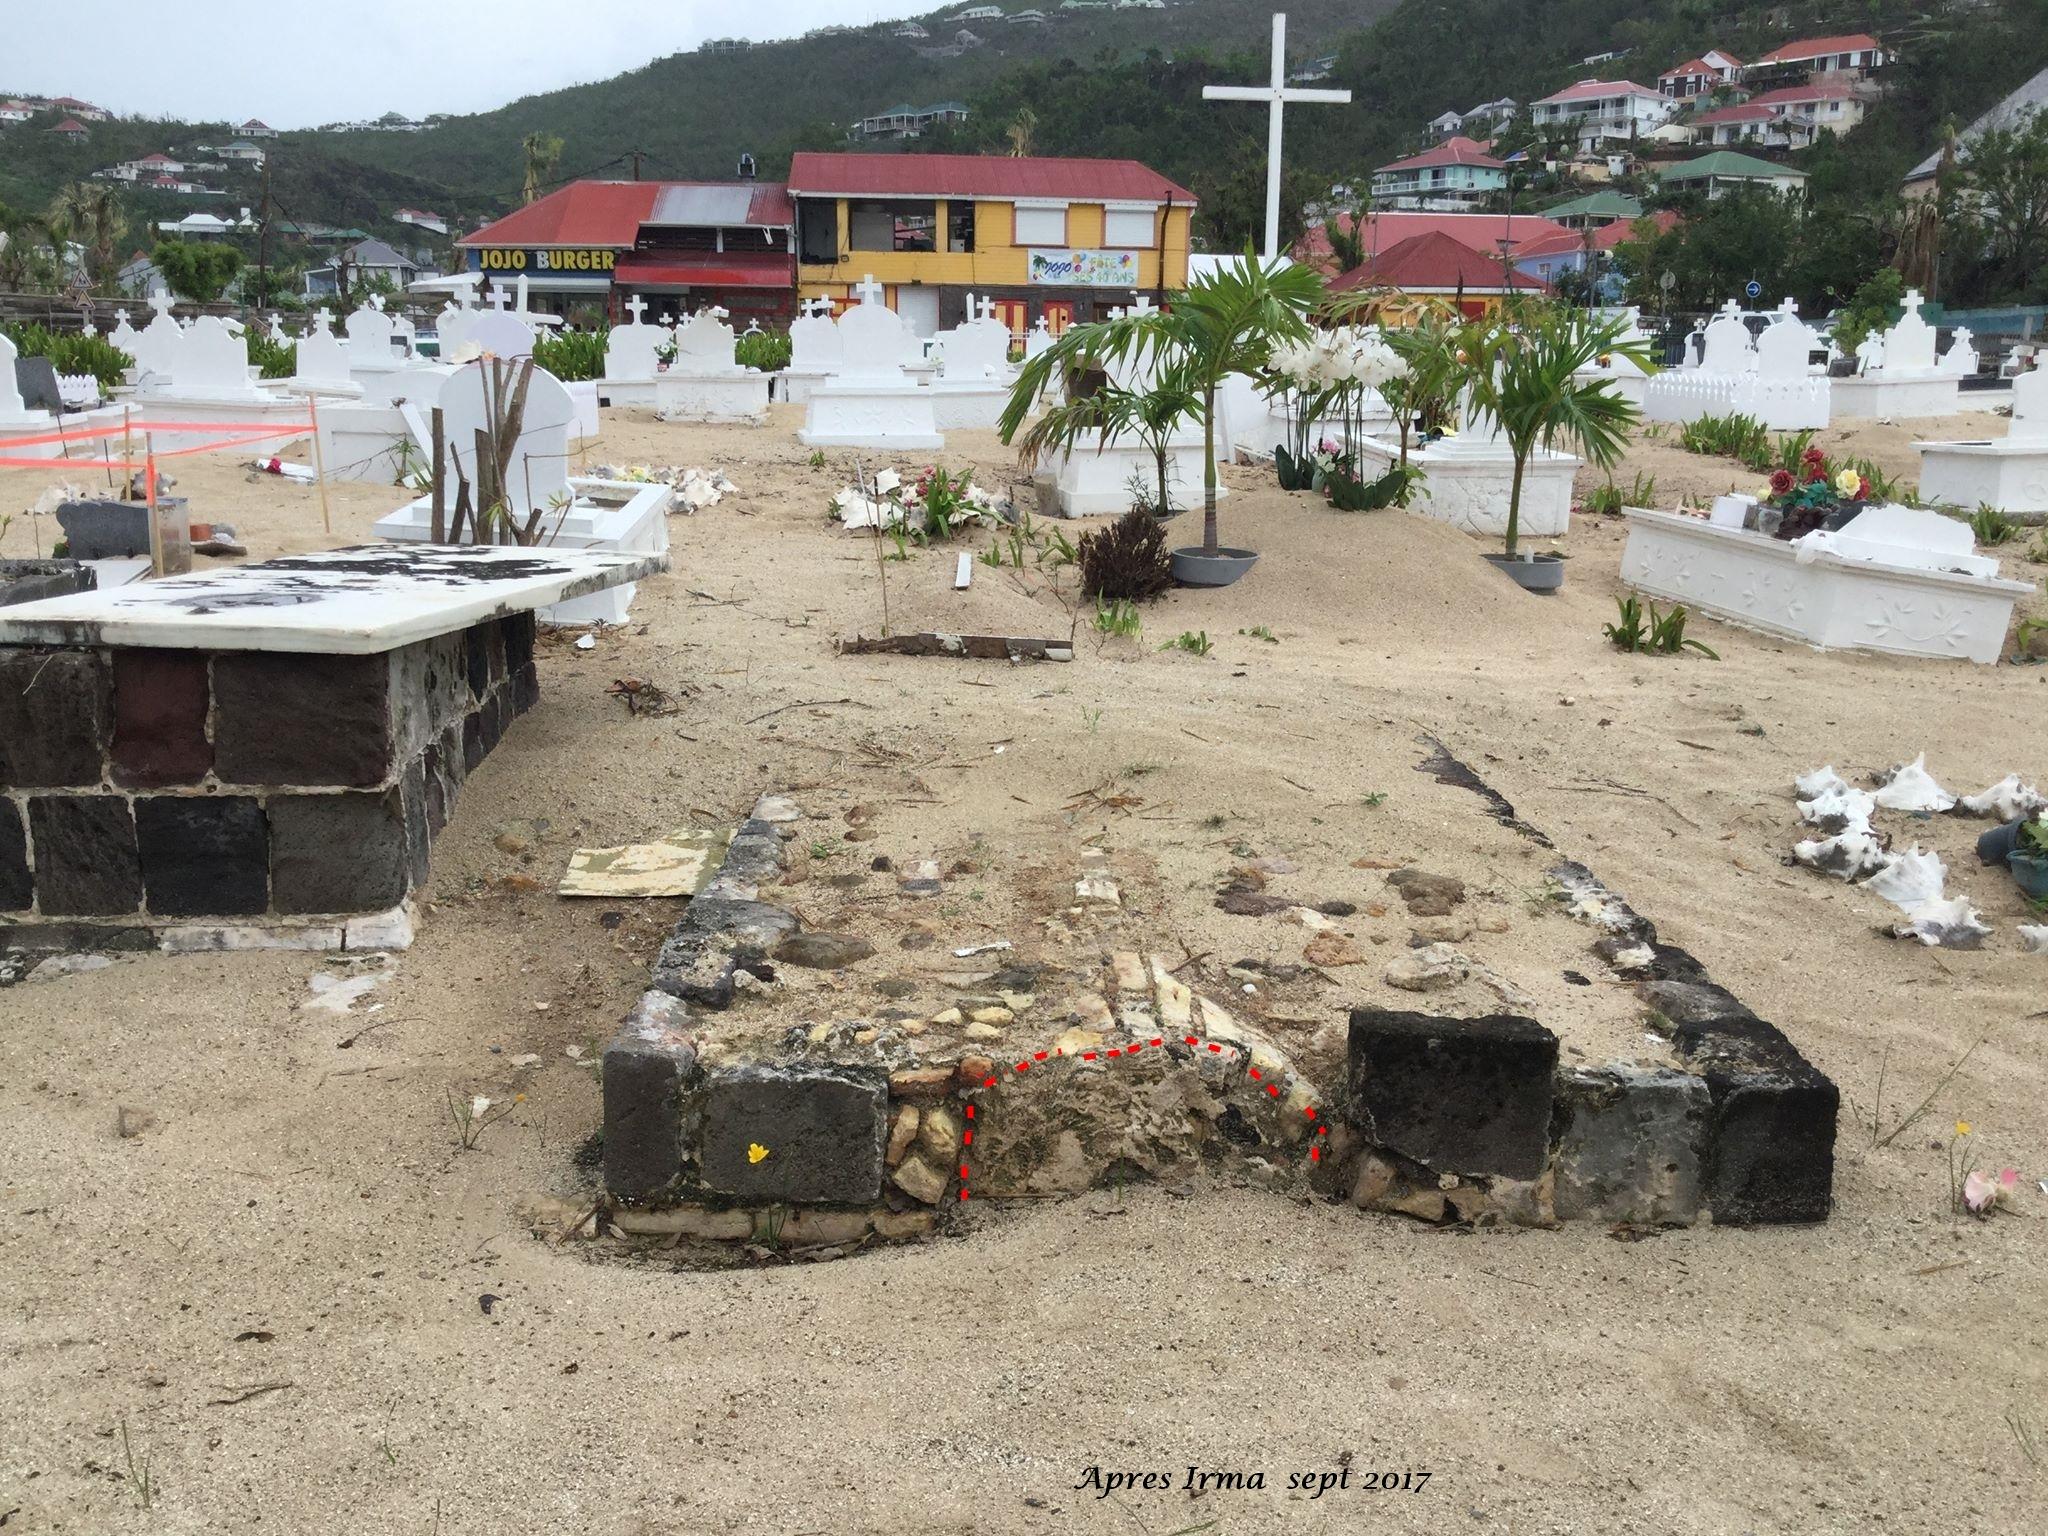 Tombe Uddenberg - Johnny Hallyday après Irma